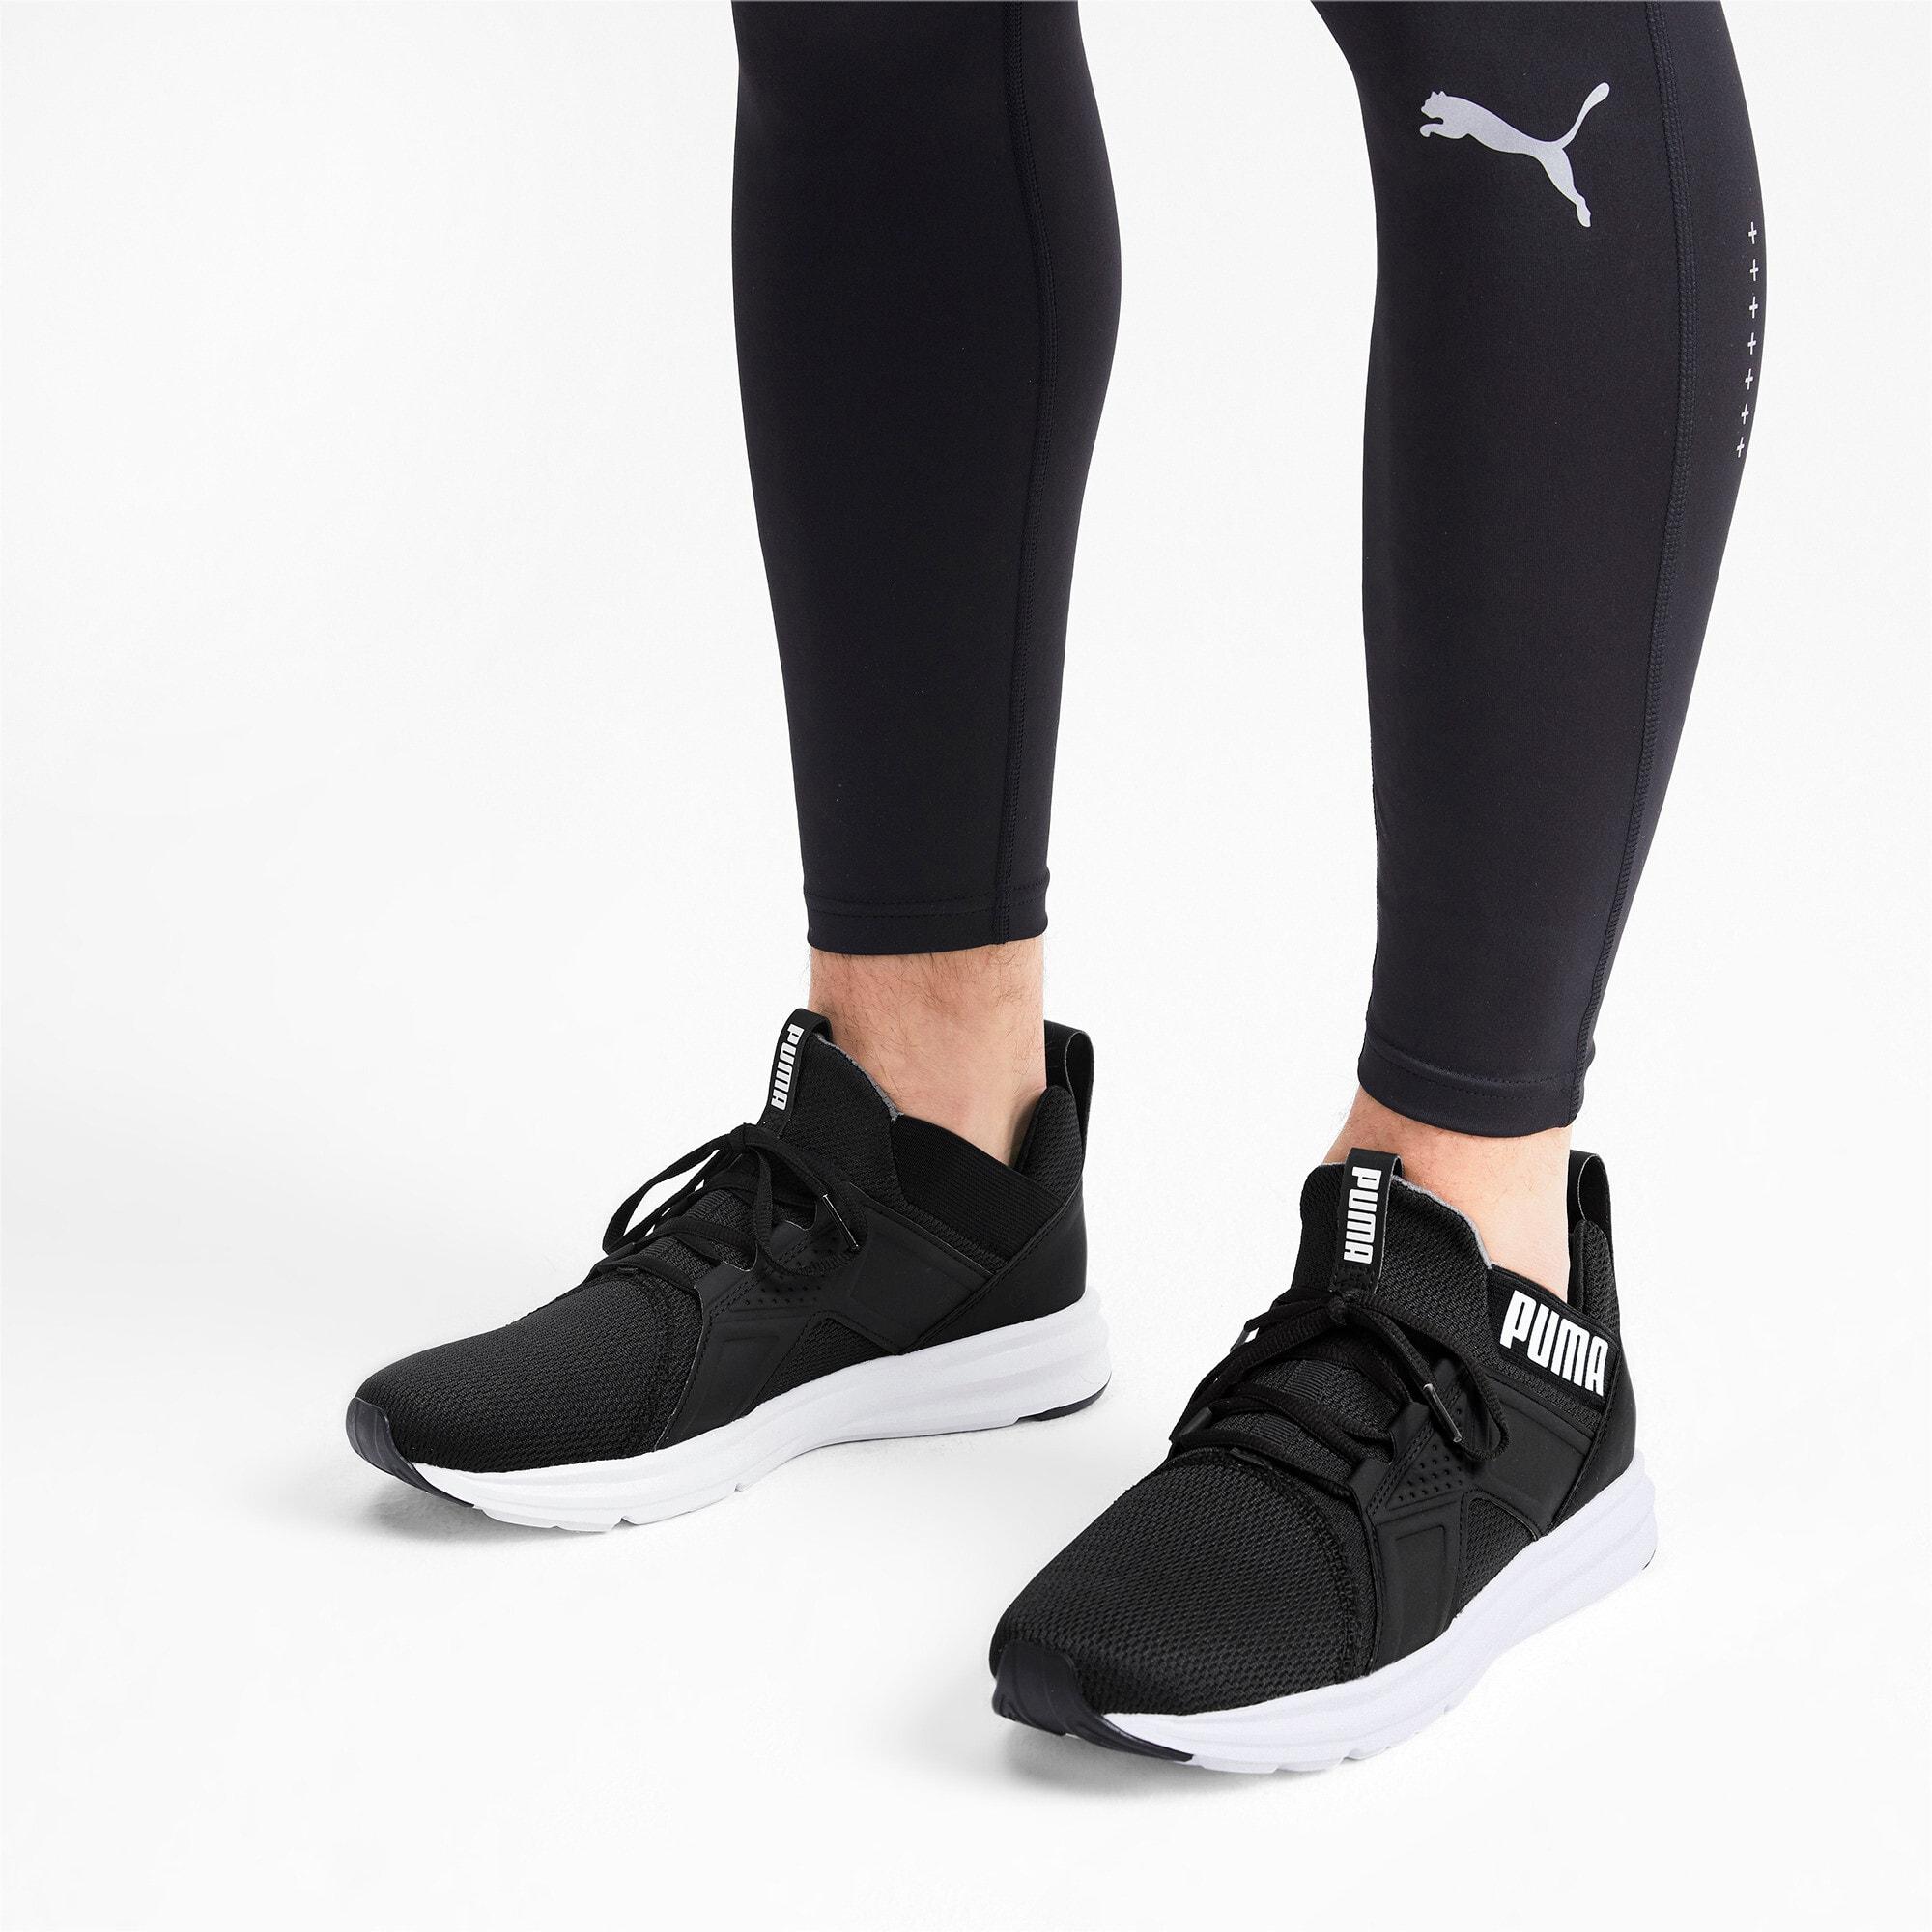 Thumbnail 2 of Enzo Sport Herren Sneaker, Puma Black-Puma White, medium